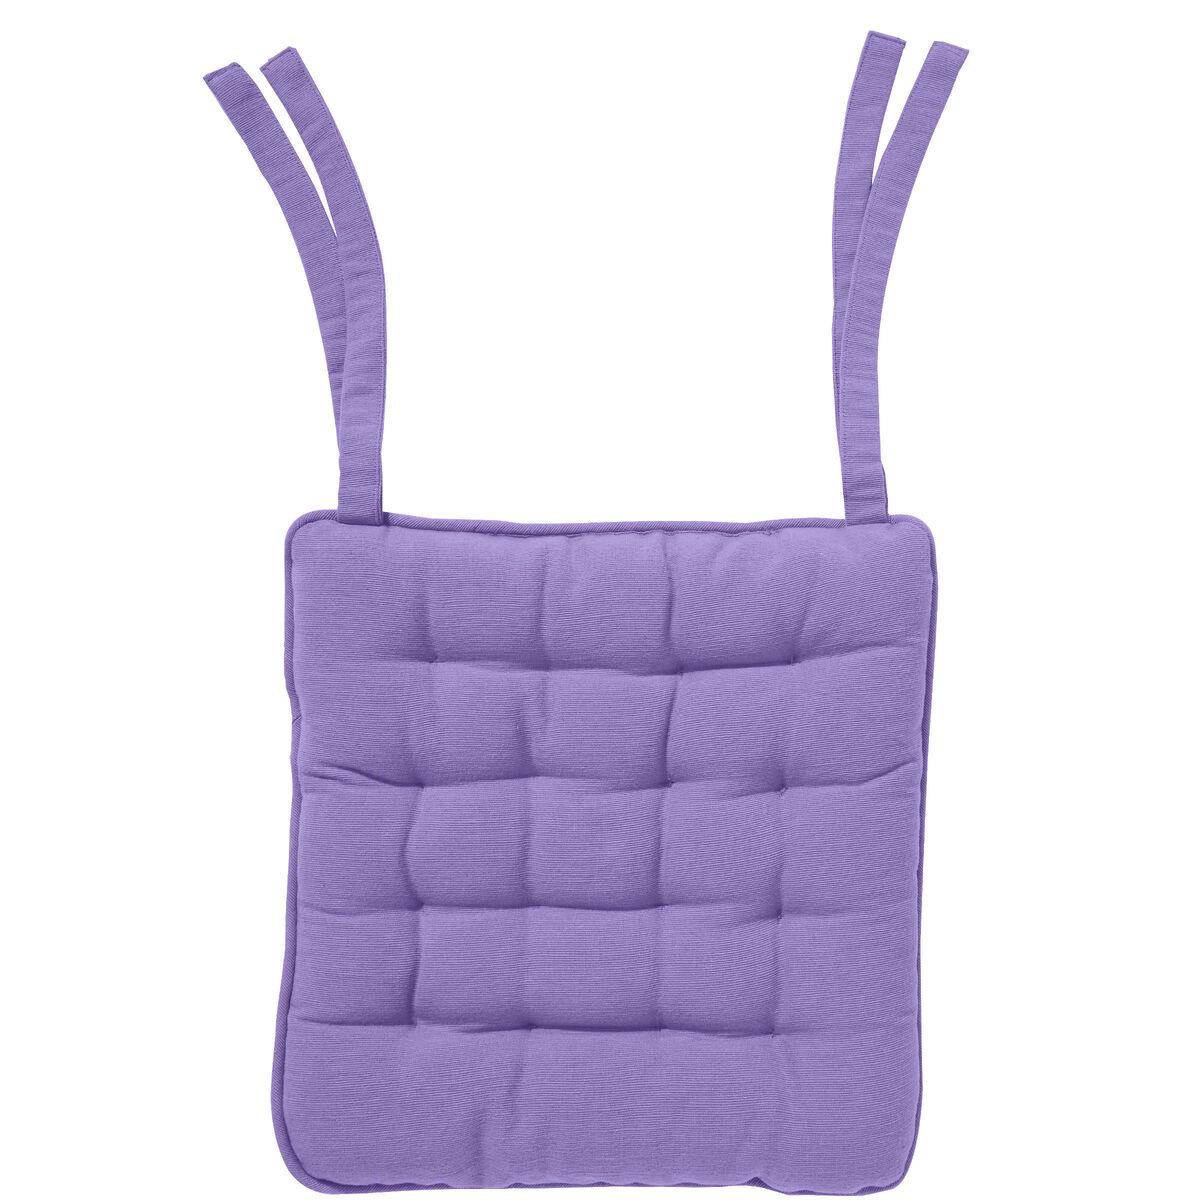 airlines stuhlkissen mit b ndern farbe lila butlers. Black Bedroom Furniture Sets. Home Design Ideas